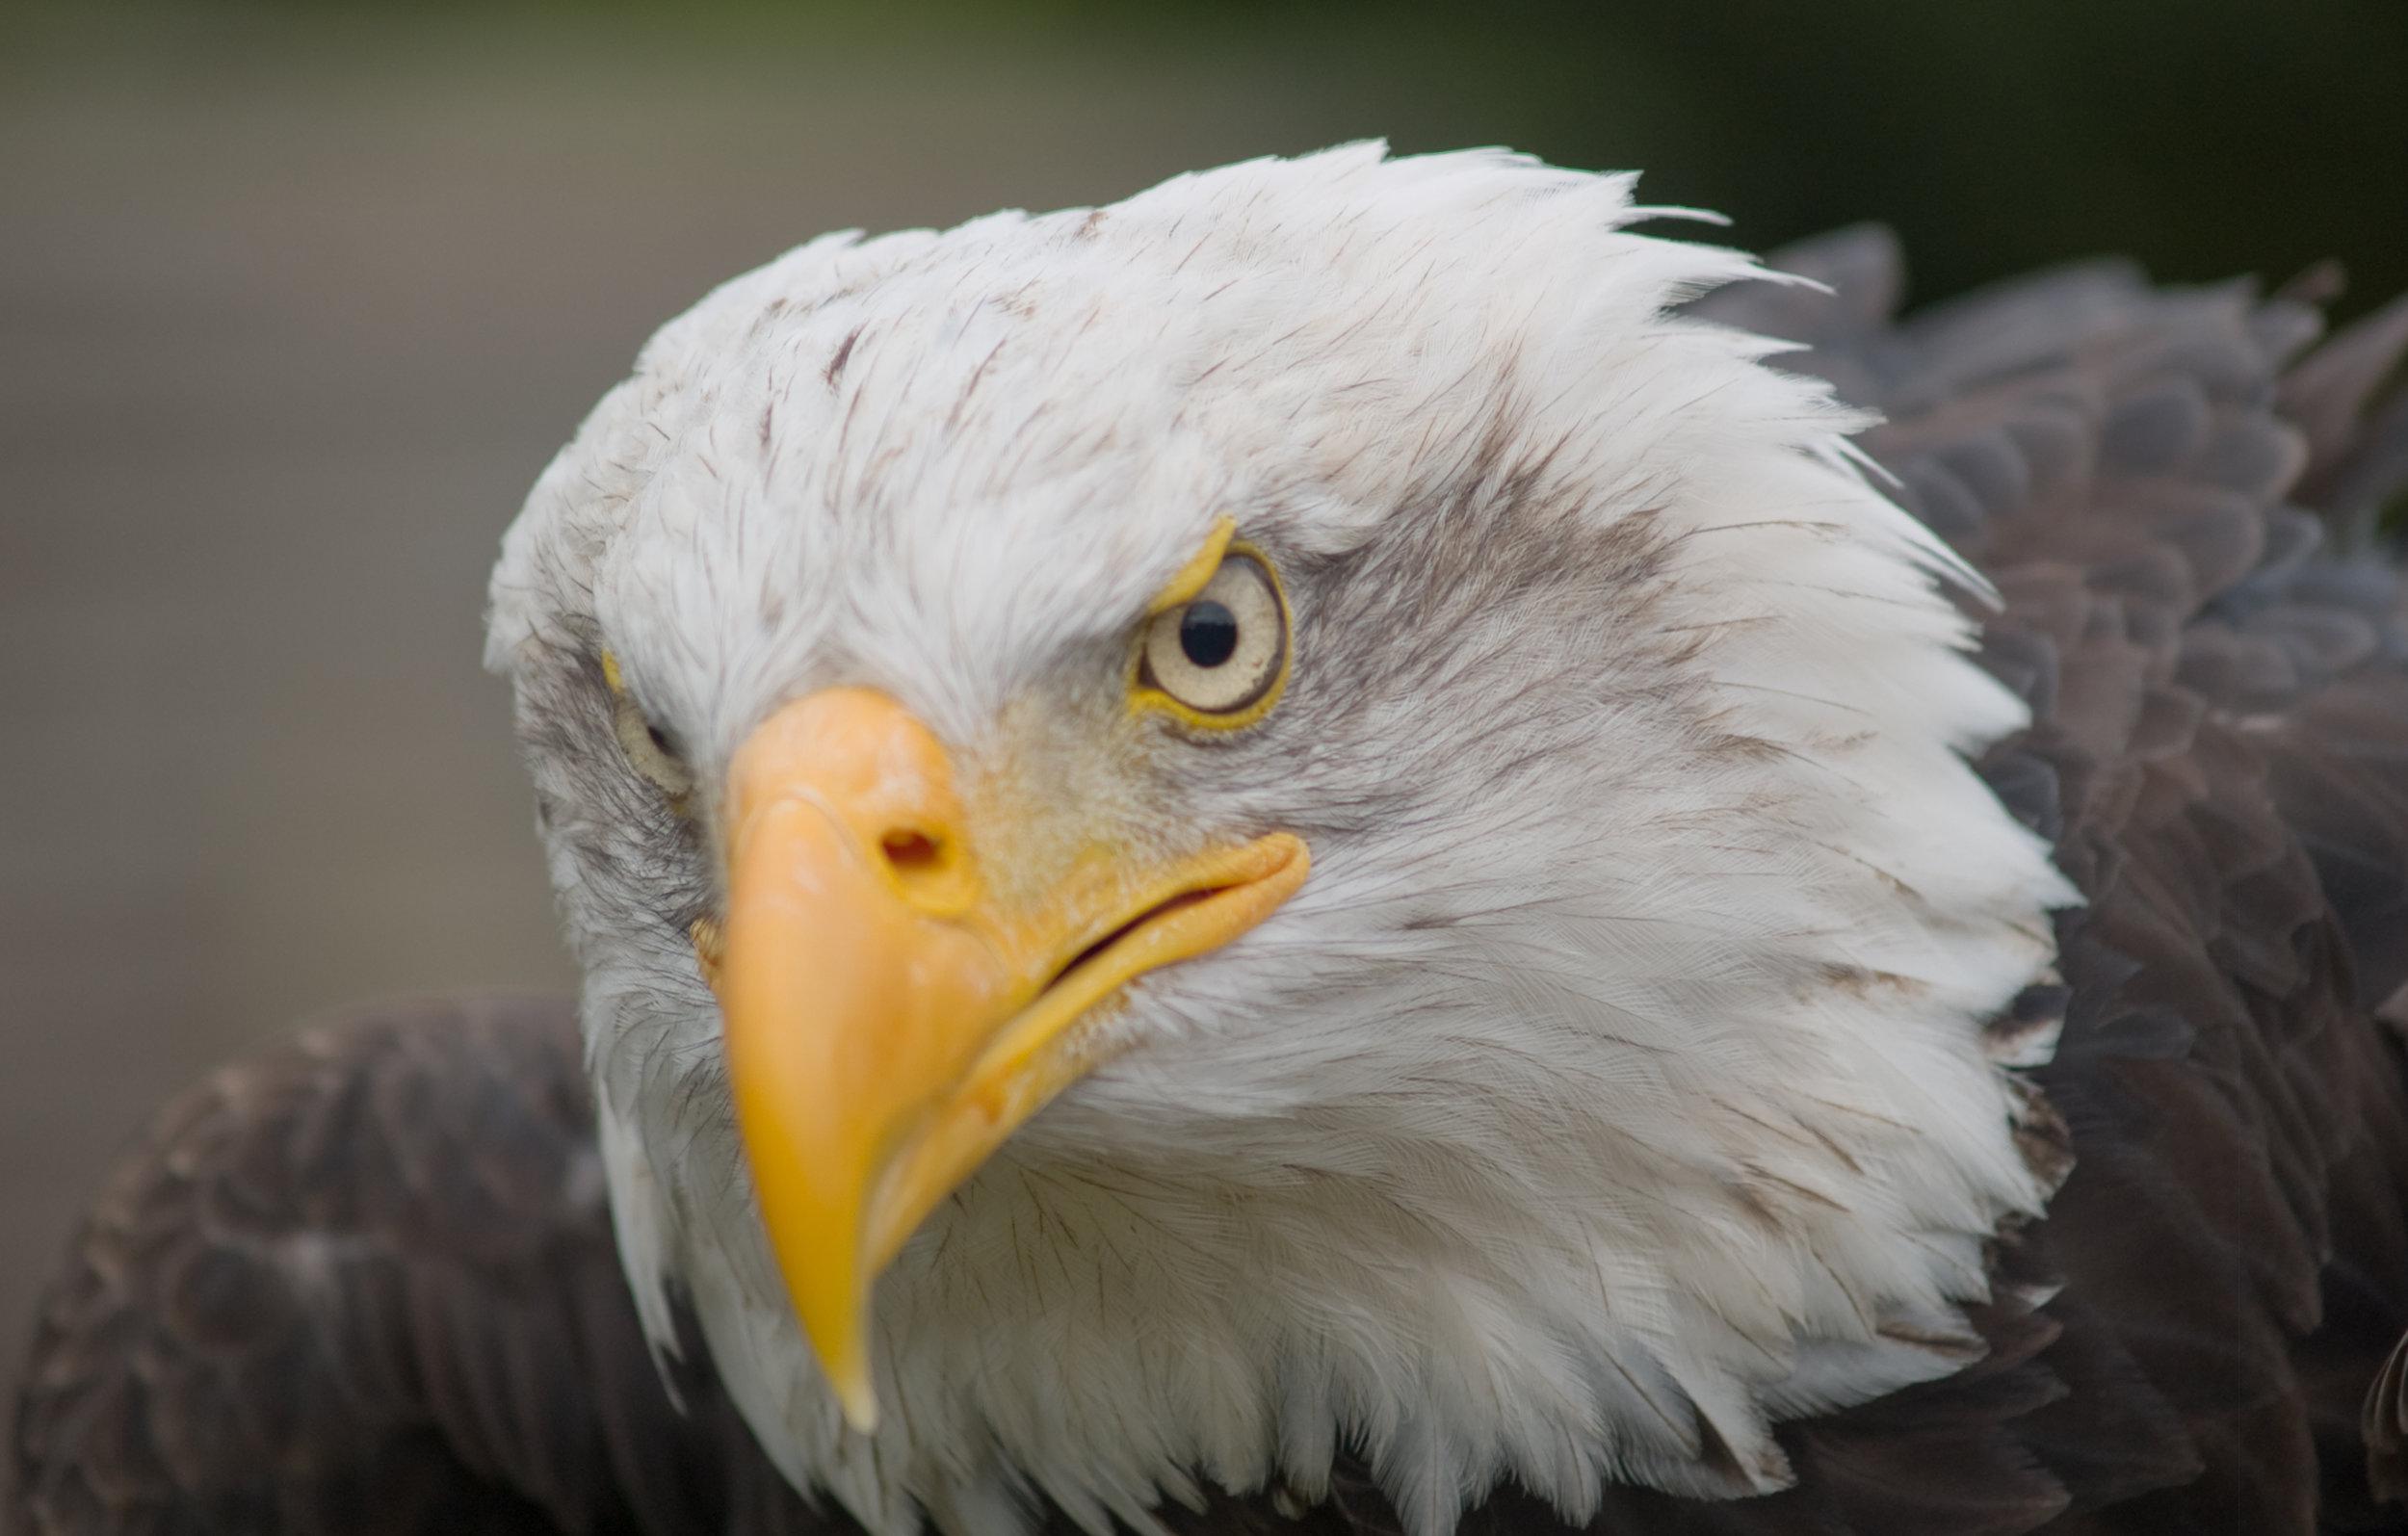 Bald Eagle, Photography by Ben Bawden